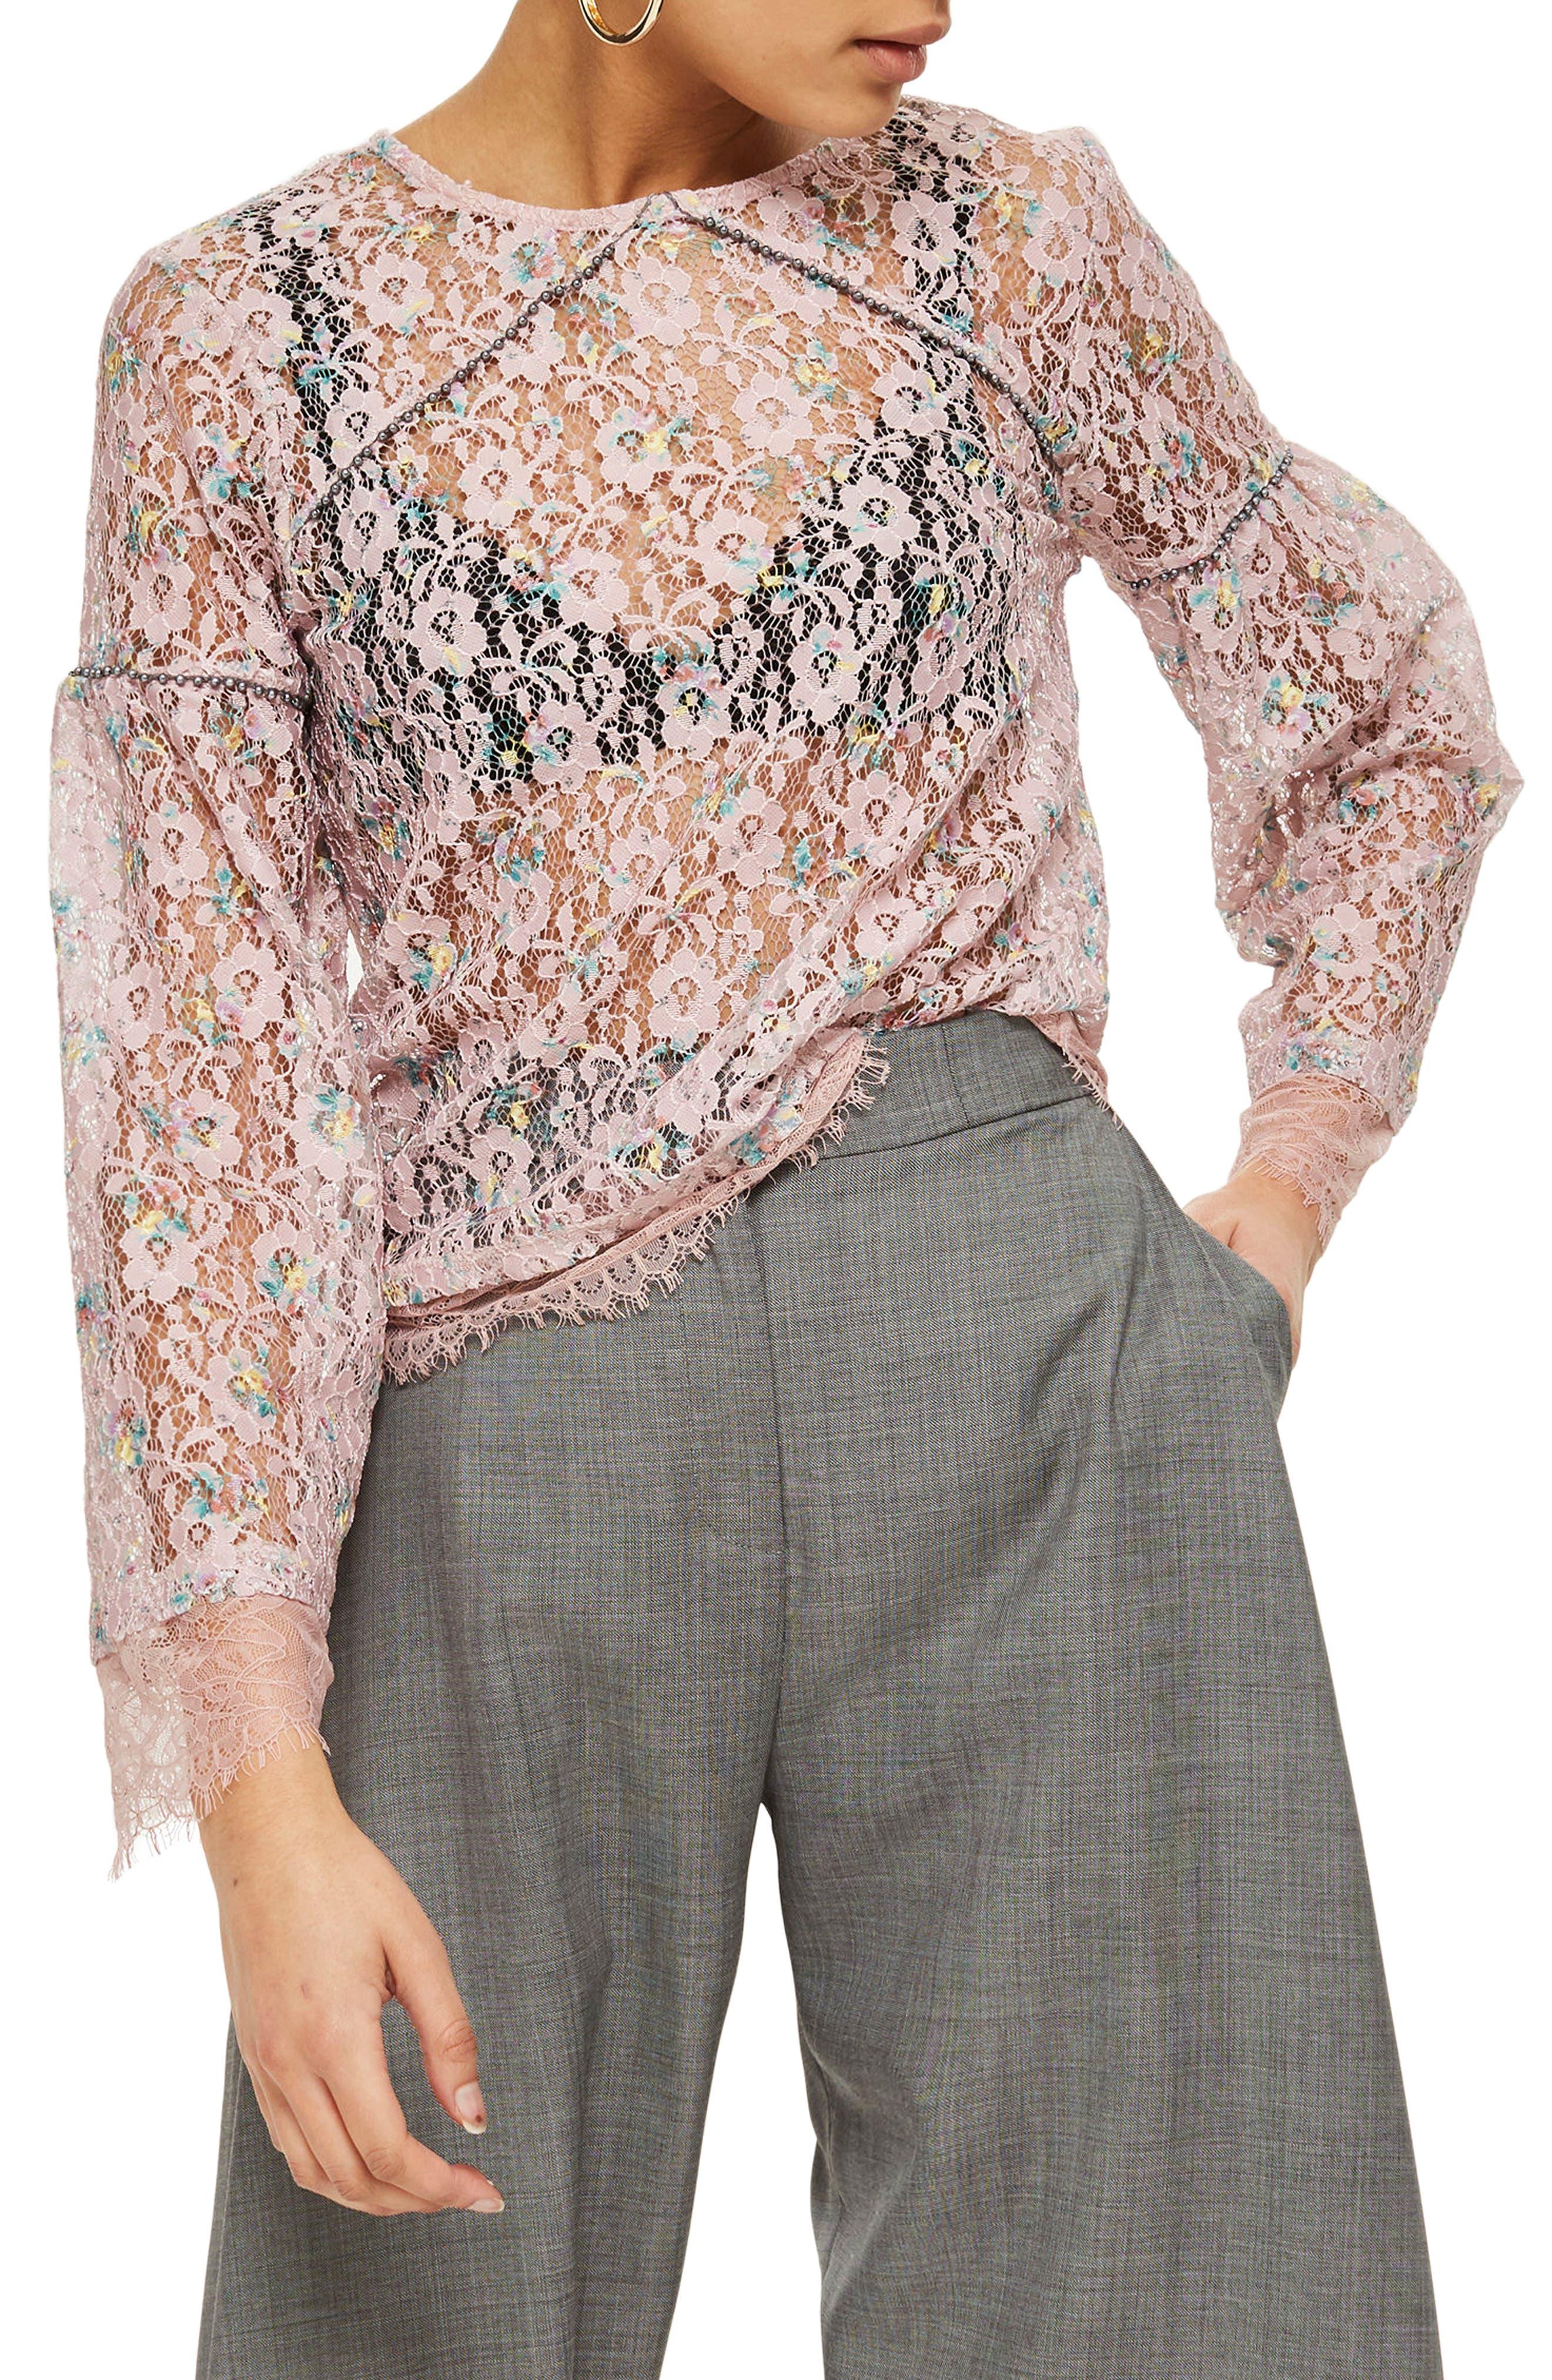 Stud Trim Lace Top,                         Main,                         color, Pink Multi